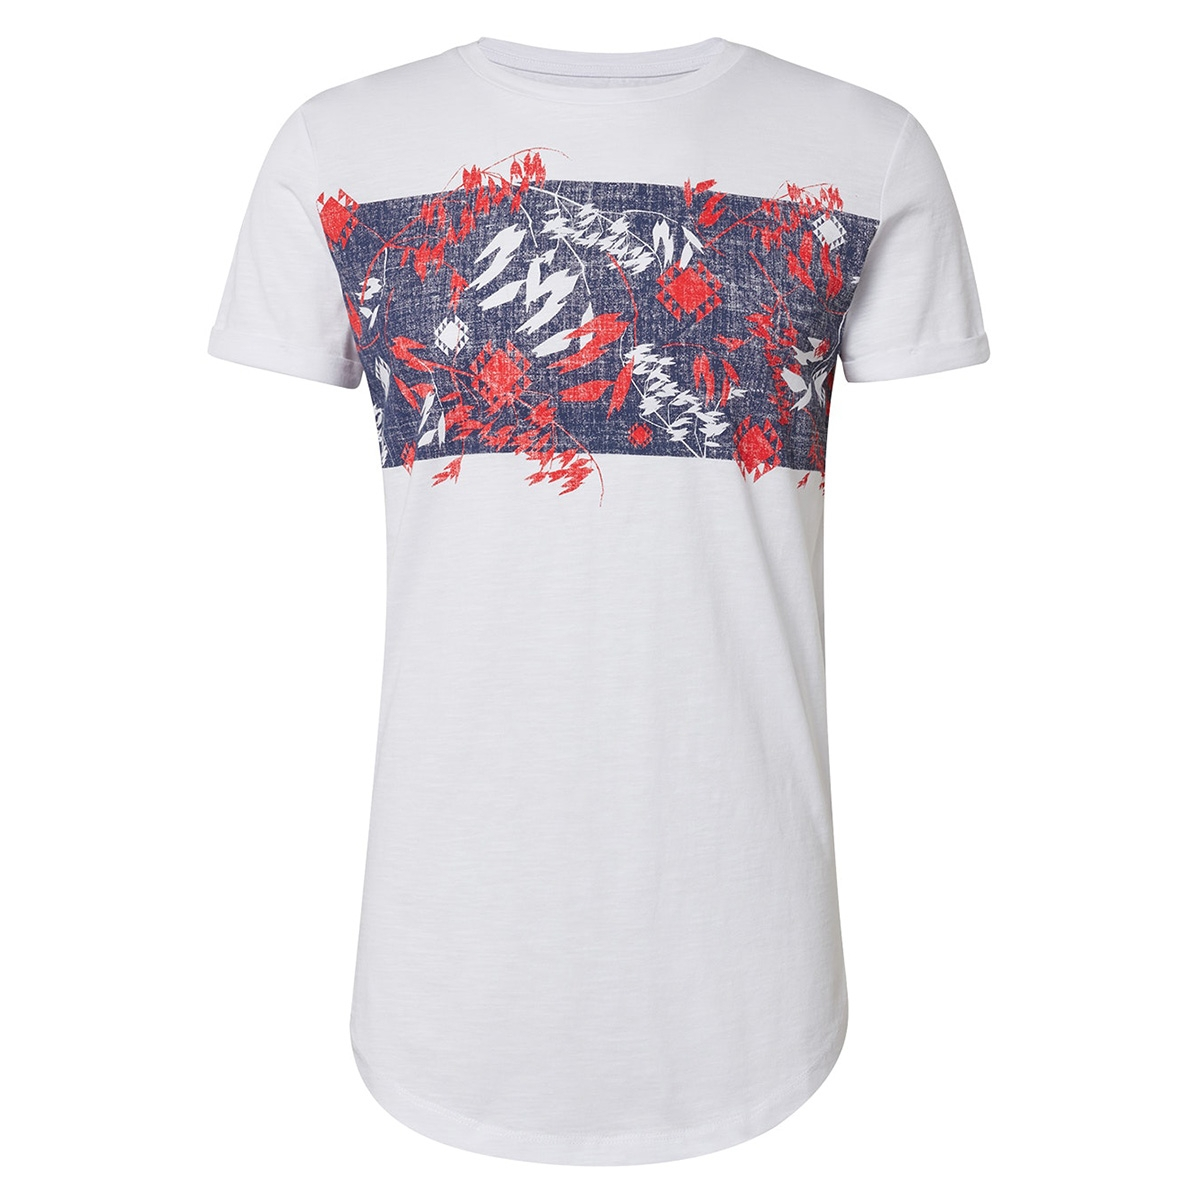 t shirt met motief 1010851xx12 tom tailor t-shirt 20000